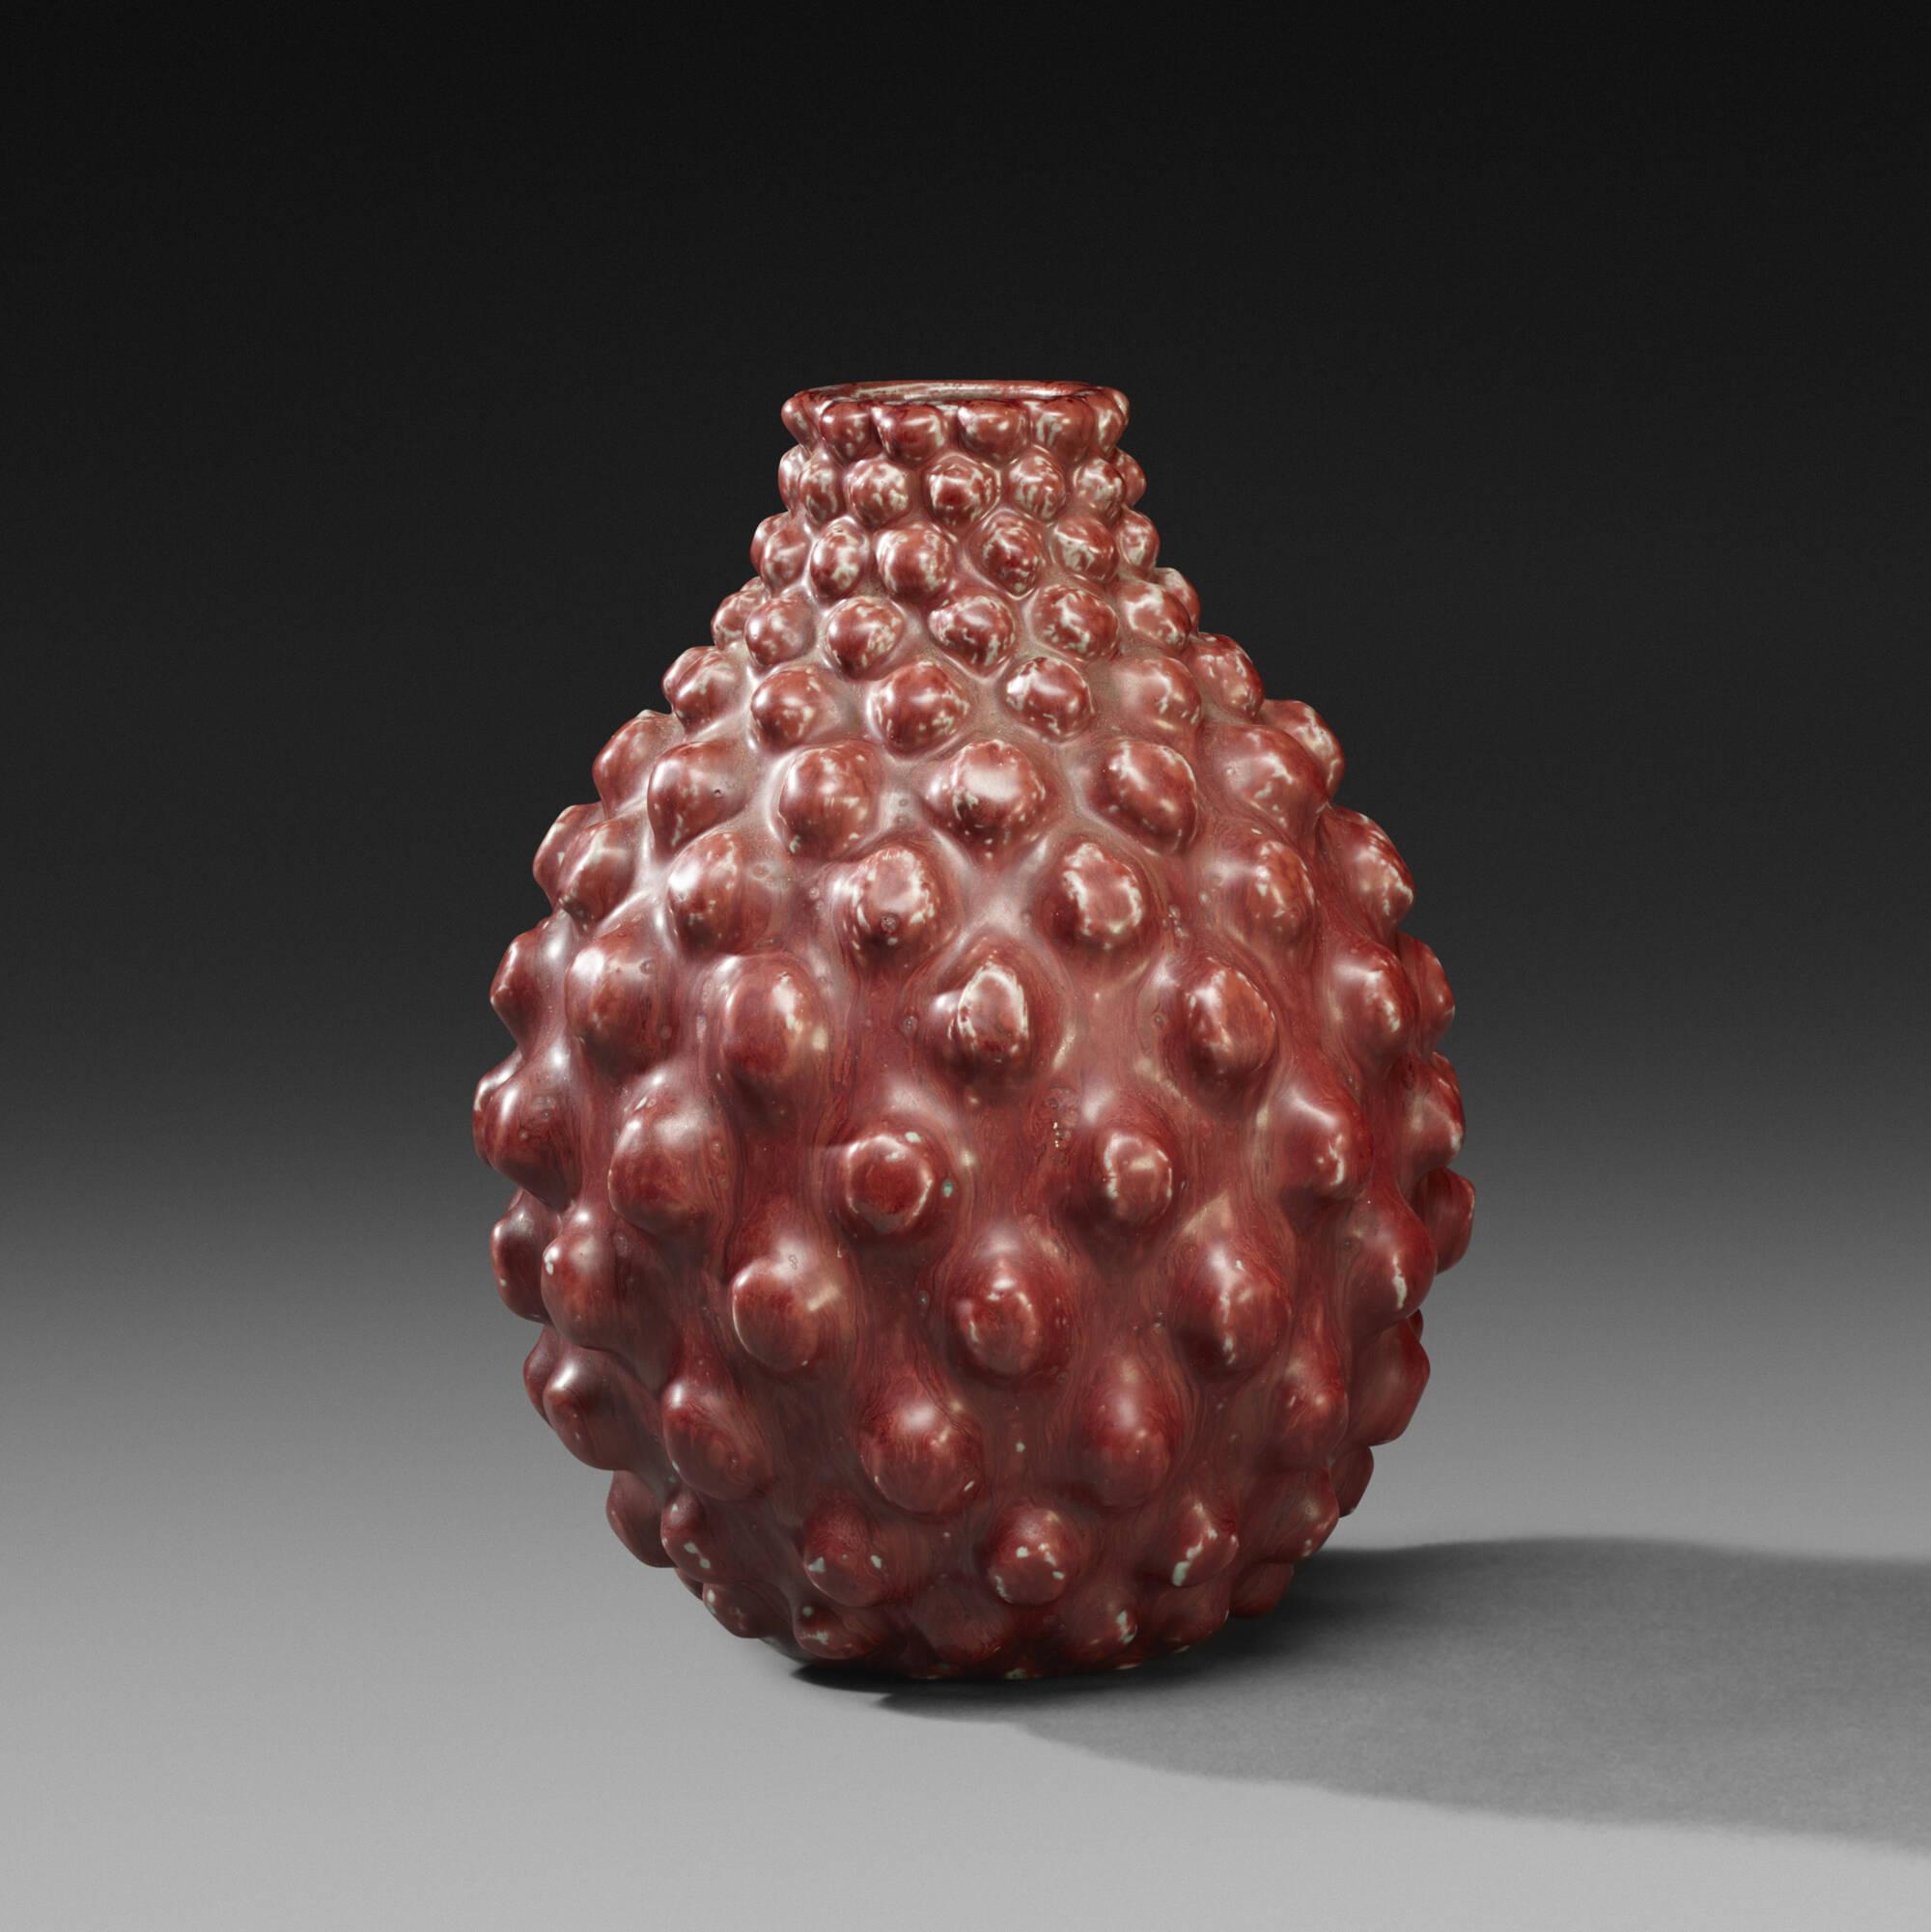 142: Axel Salto / Budding vase (1 of 2)